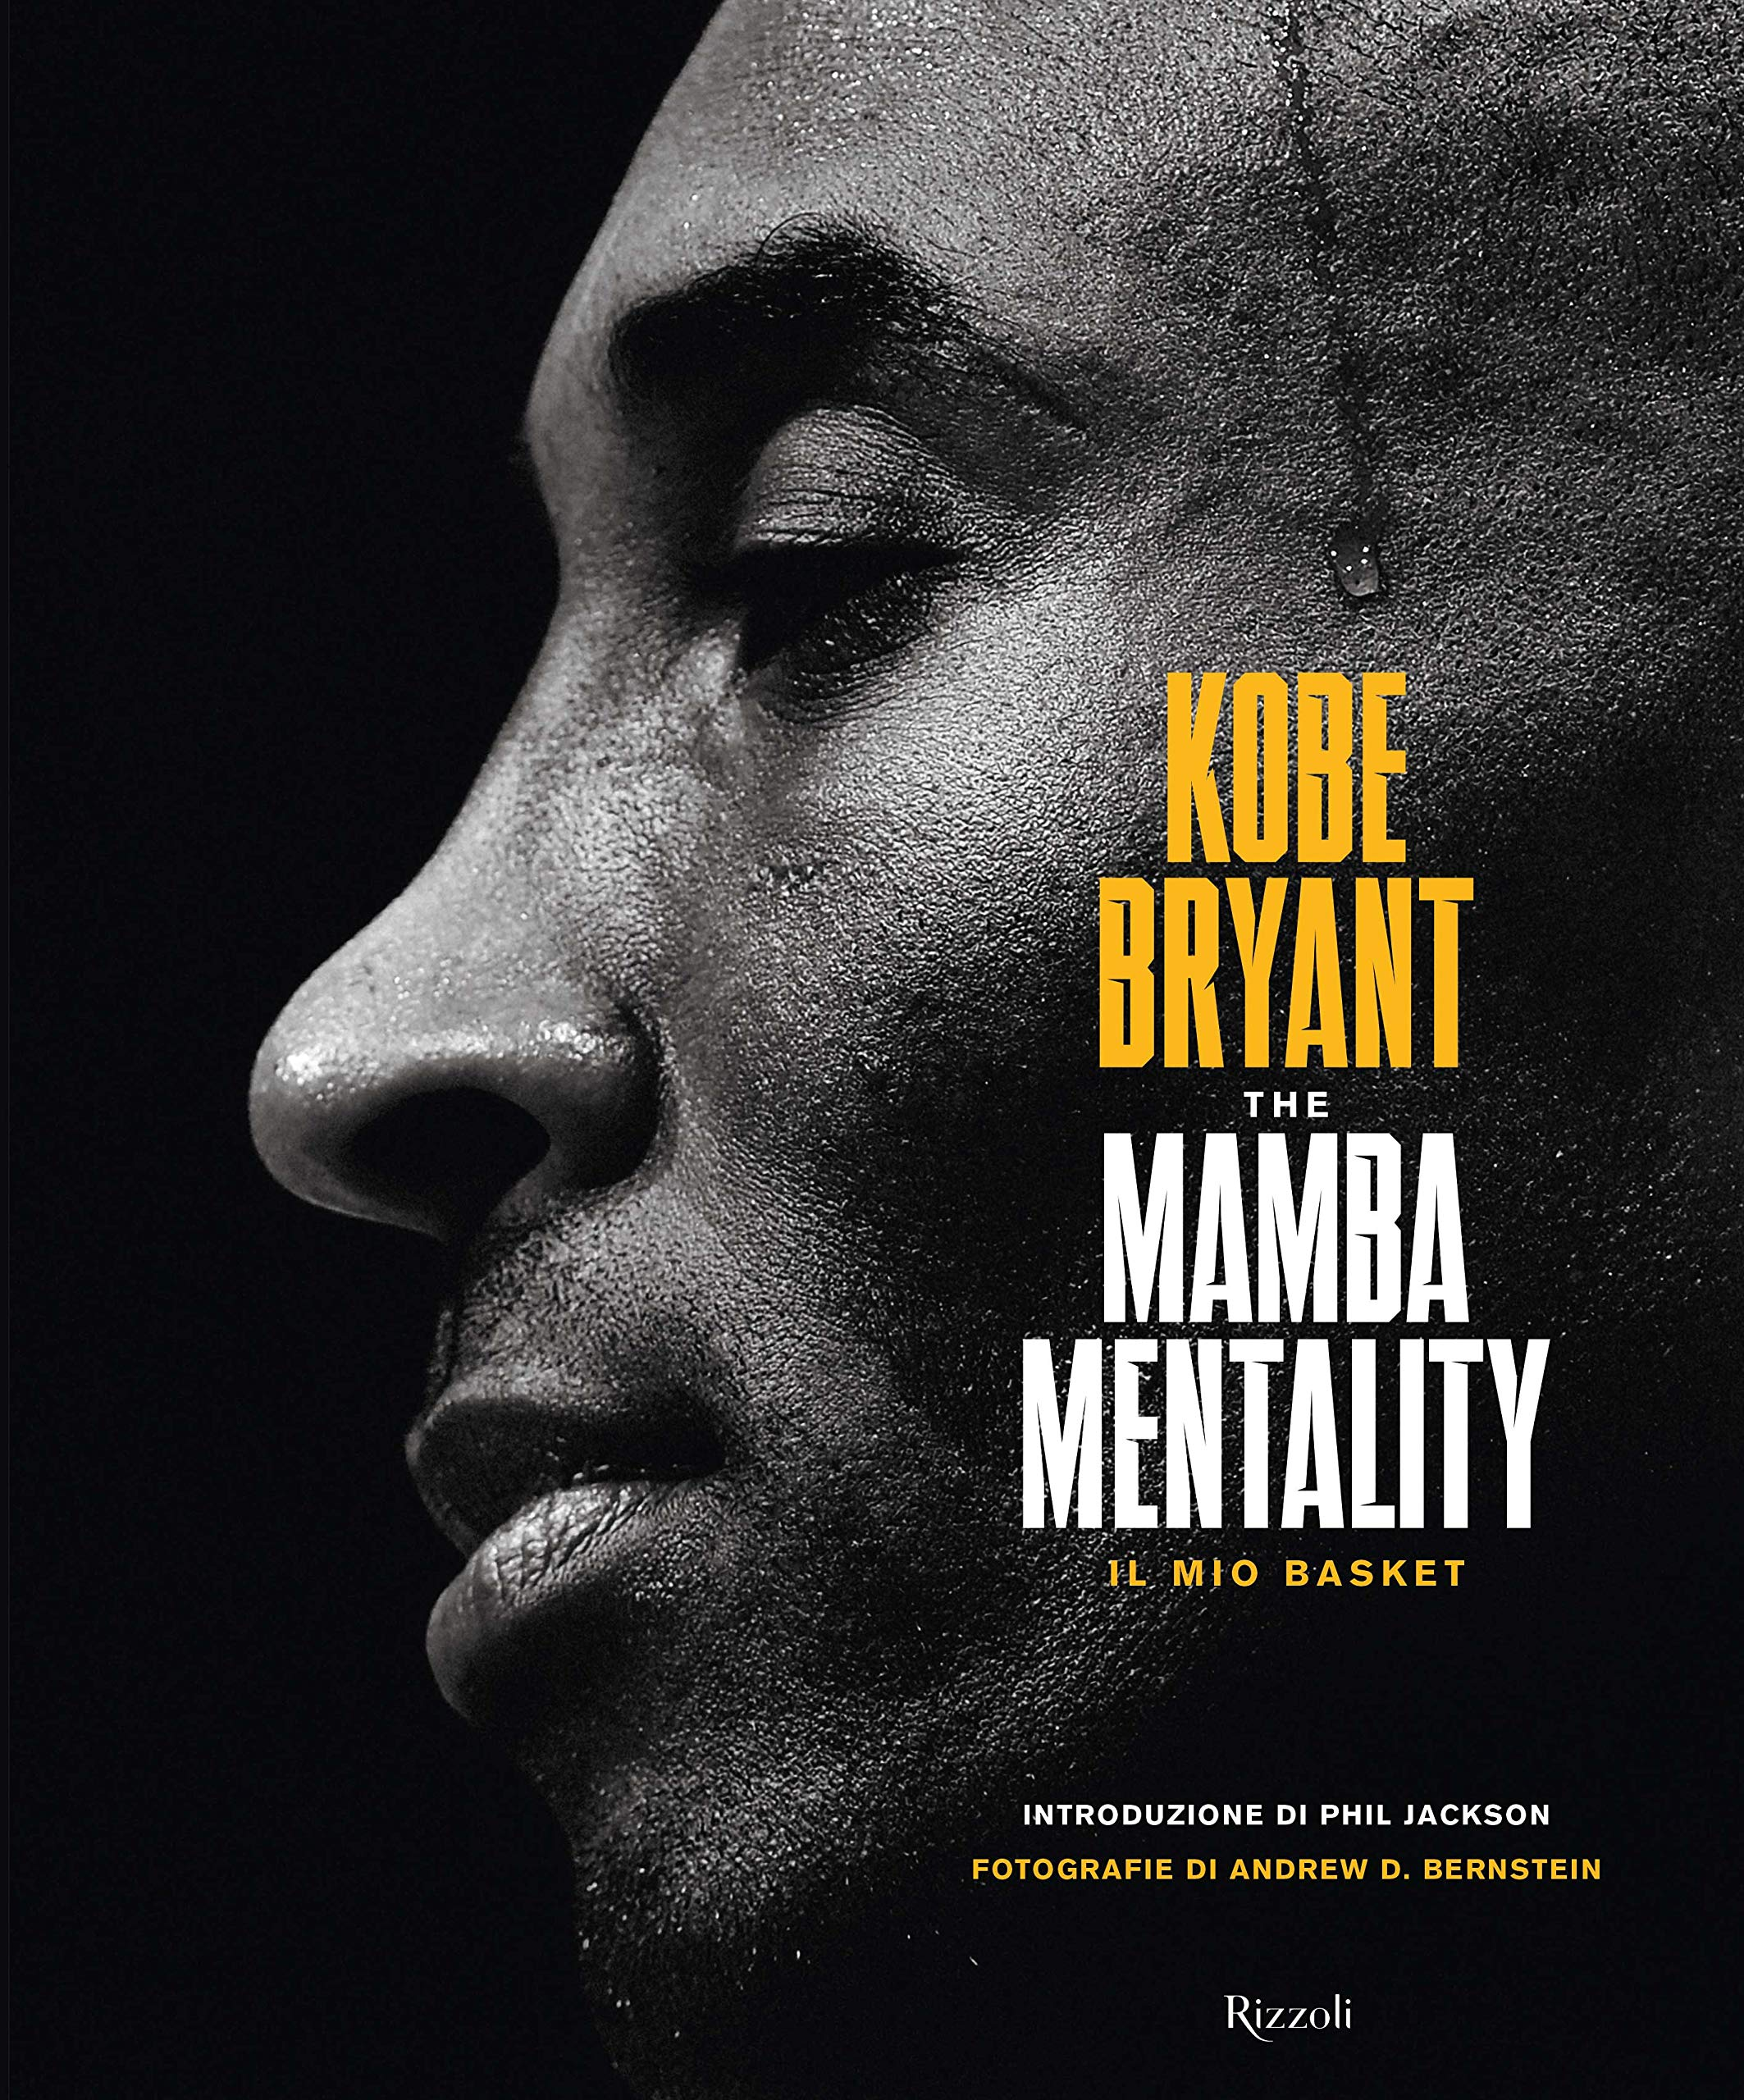 The Mamba mentality. Il mio basket Copertina rigida – 13 nov 2018 Kobe Bryant Rizzoli 8817108340 Altra non illustrata